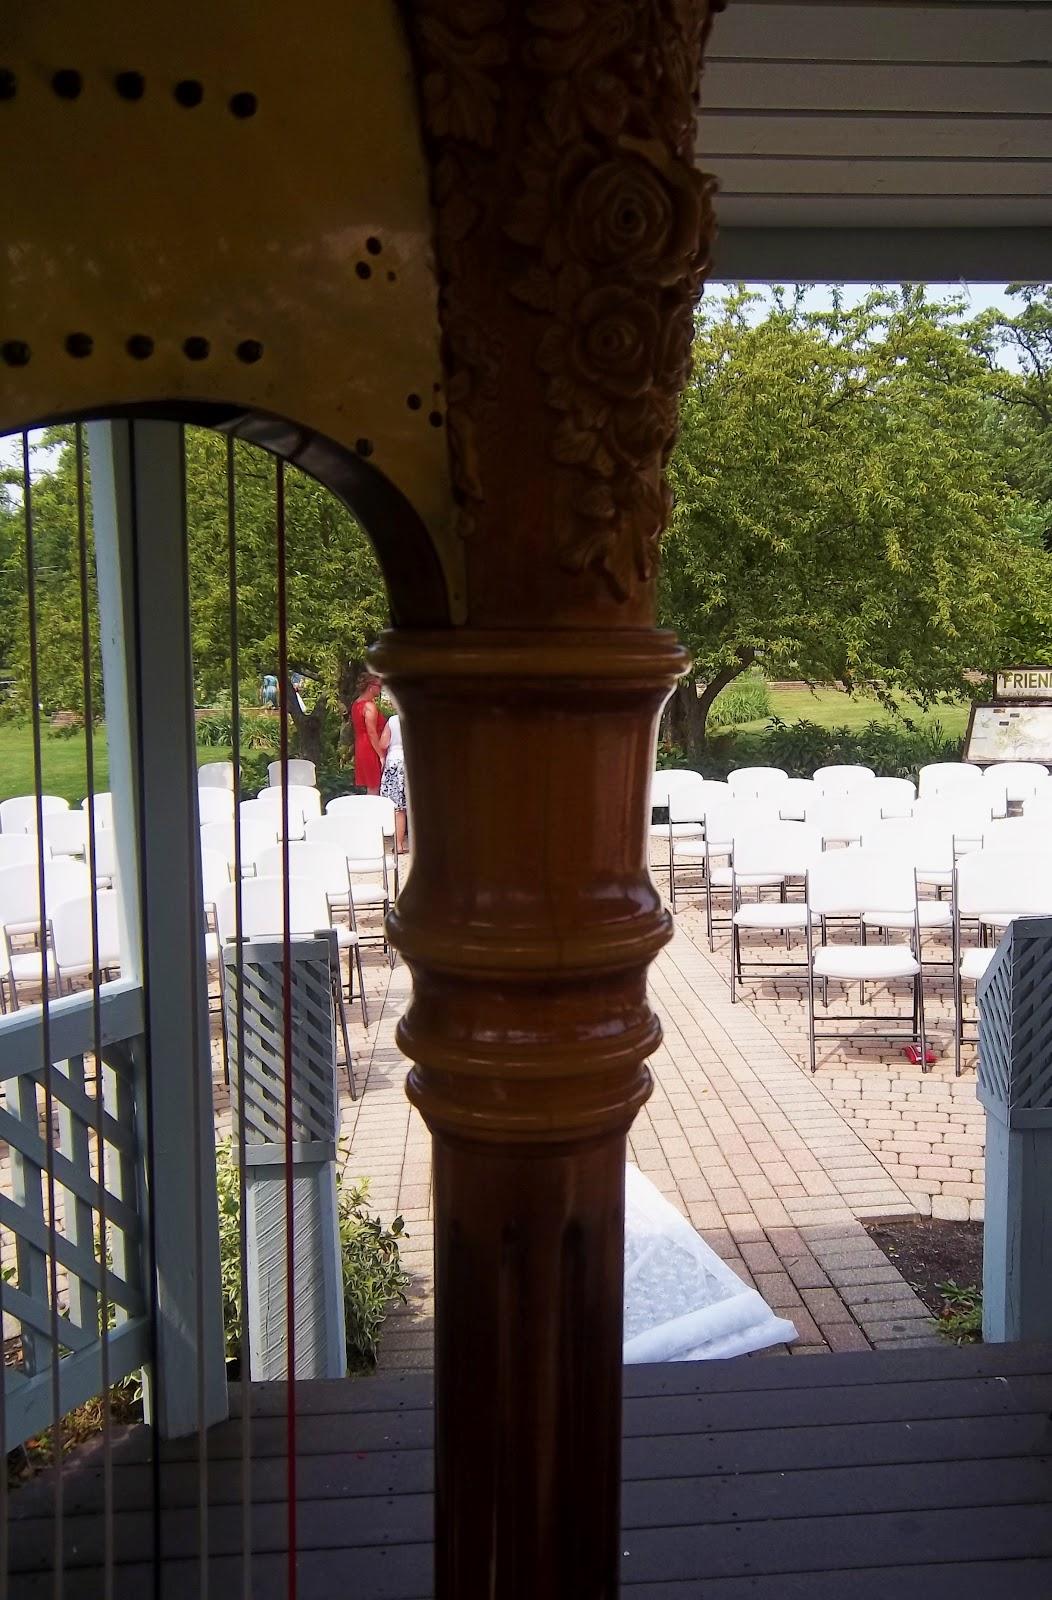 http://4.bp.blogspot.com/-mj93ivN0qOE/T_yyDBvuQWI/AAAAAAAABgo/MEb5cwEdf_0/s1600/Ogden_Gardens_Valparaiso_Wedding_harpist.JPG